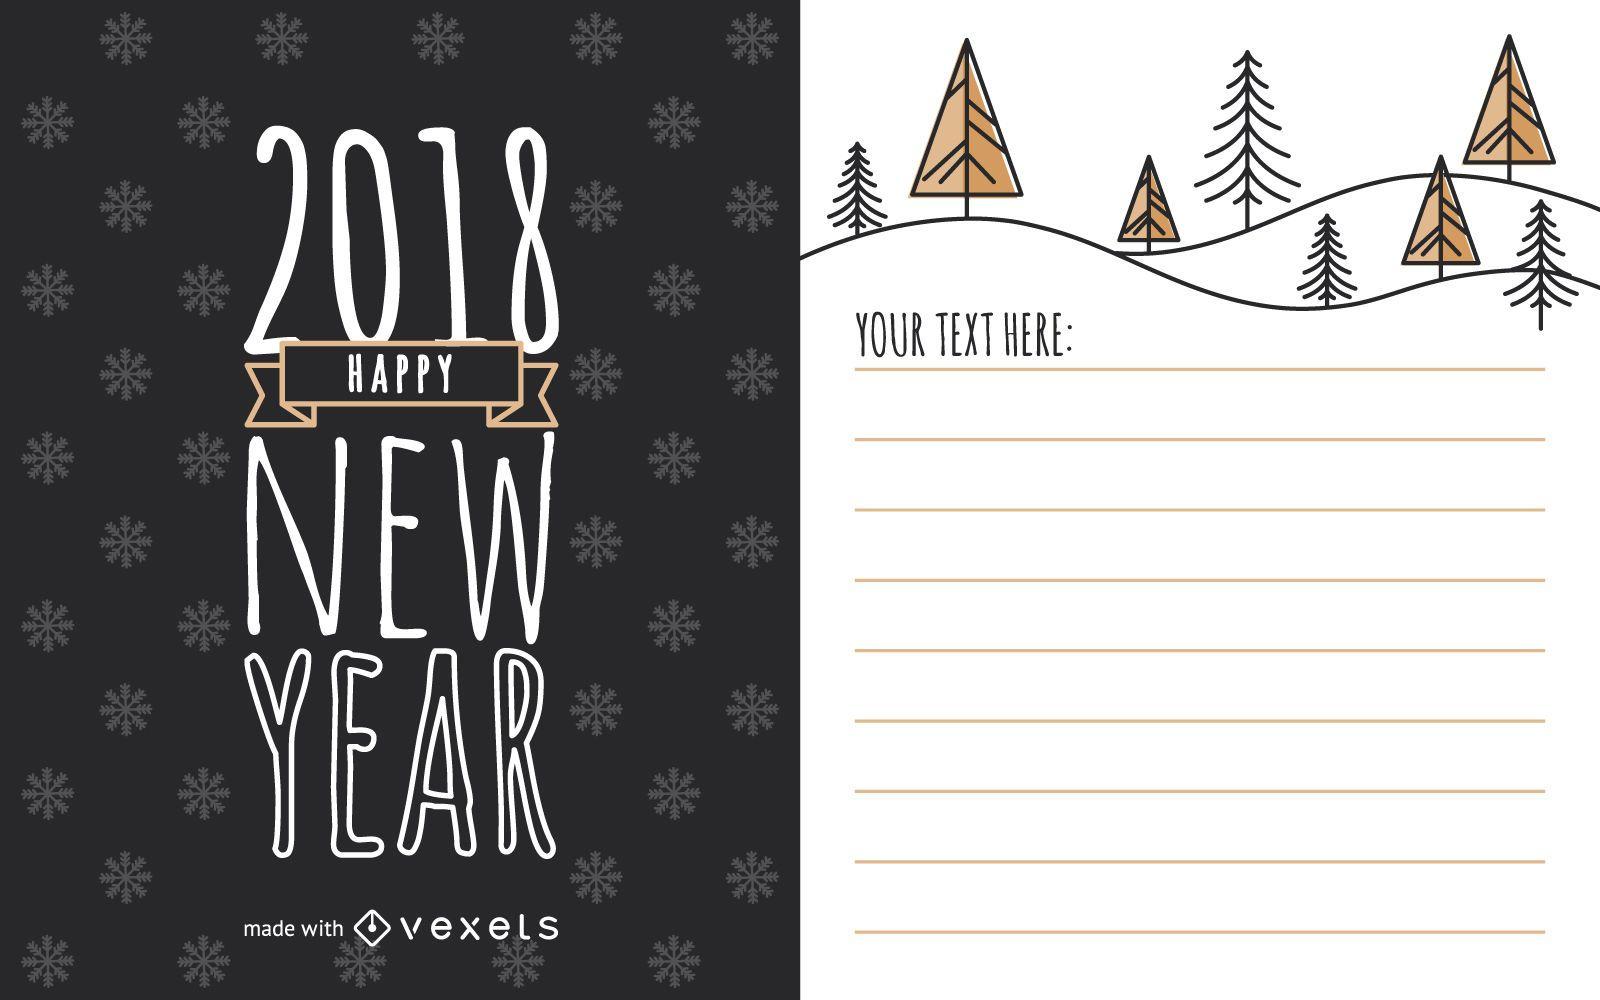 Cute 2018 New Year card maker